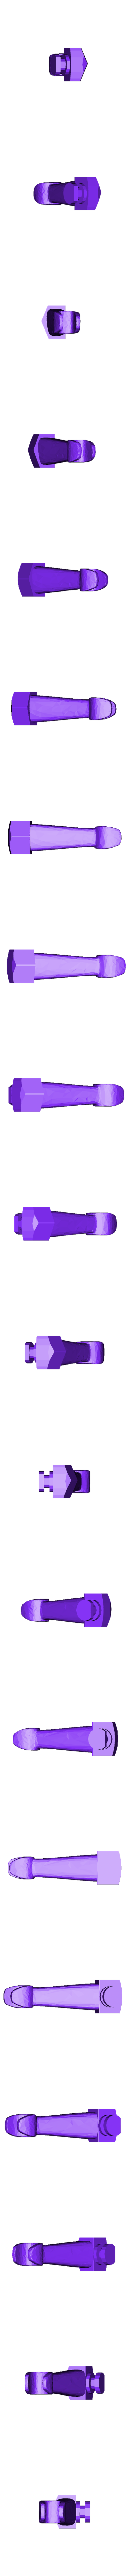 playmobil_desmontable_darth_vader_1.stl Download free STL file Darth Vader Playmobil • 3D printable object, madsoul666